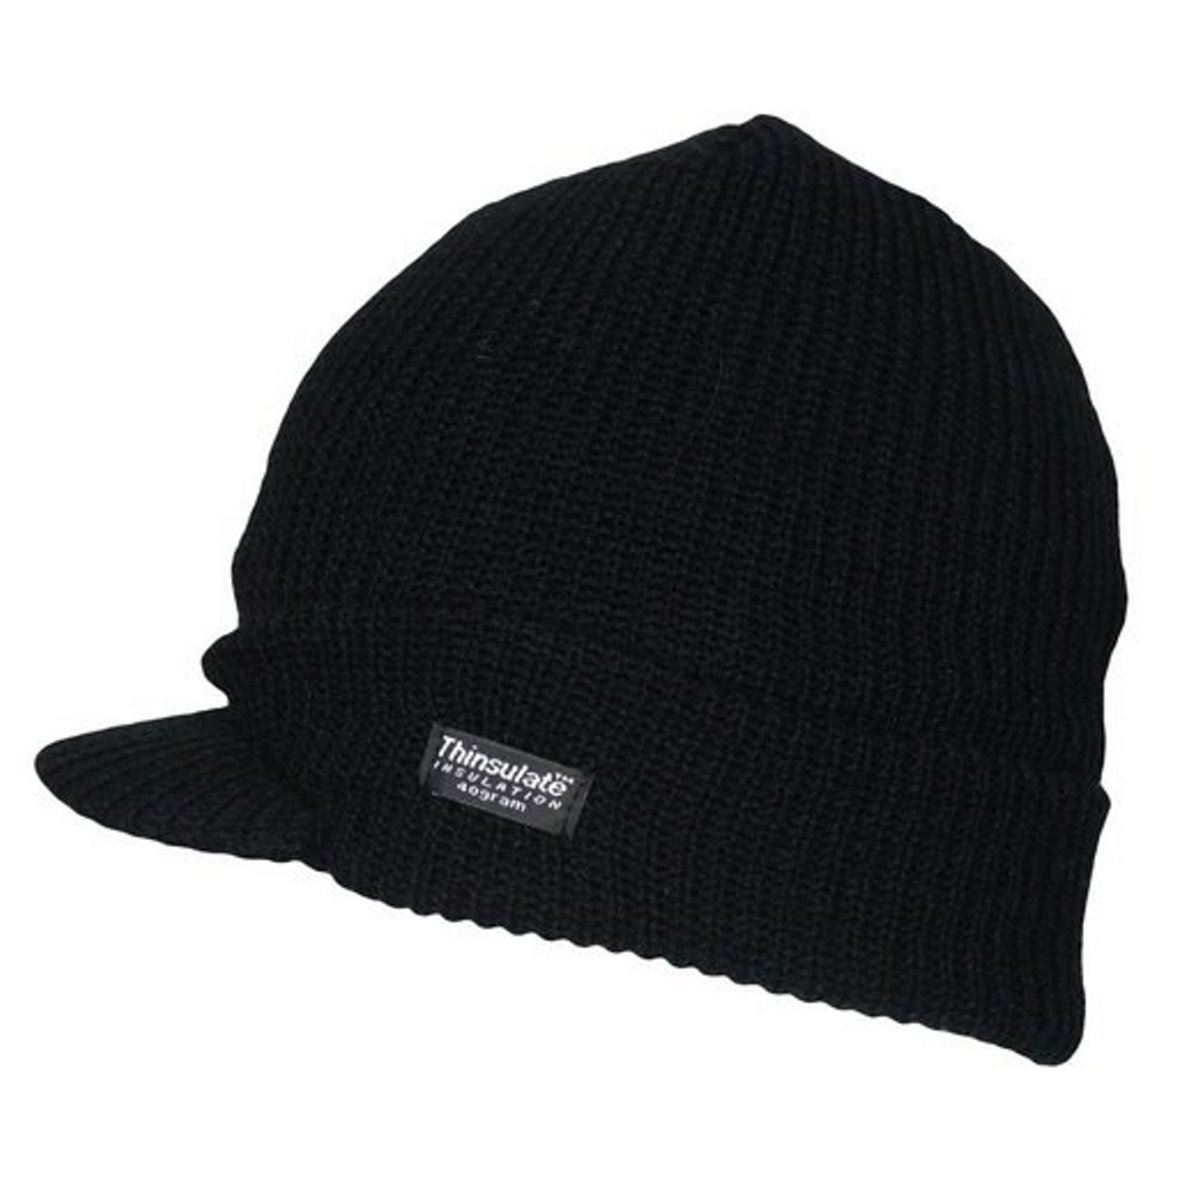 Adult BLACK Thinsulate Beanie Hat Cap Thermal German Winter Warm Ski Peak  Visor b9f8a16f1e6d